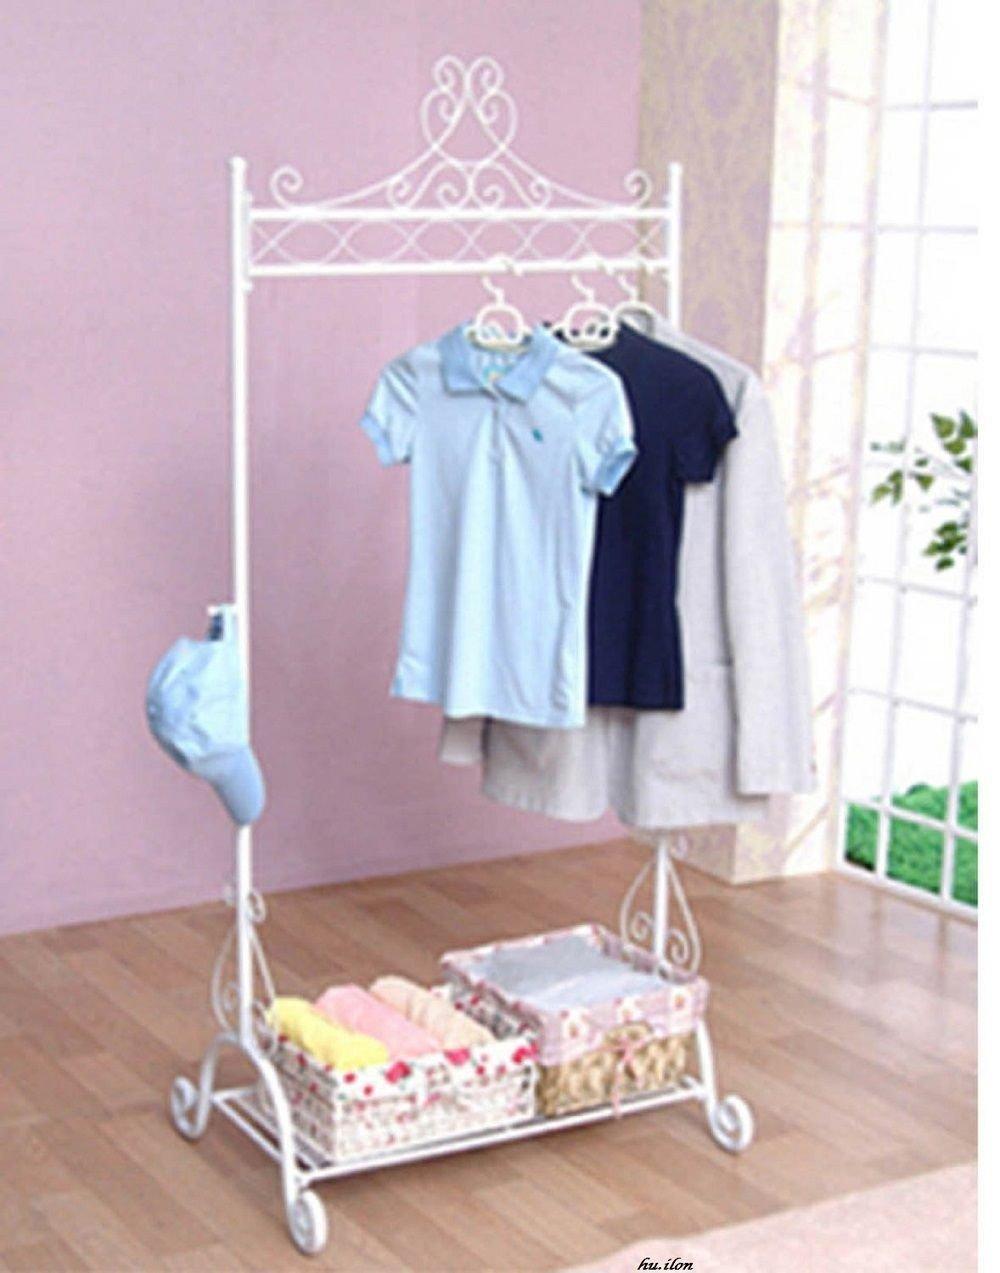 Generic elf Storageging Stand Vint Clothes Hanging Garment Rack Stand Vintage Stand Closet White Shelf Storage Garment Rack Sta